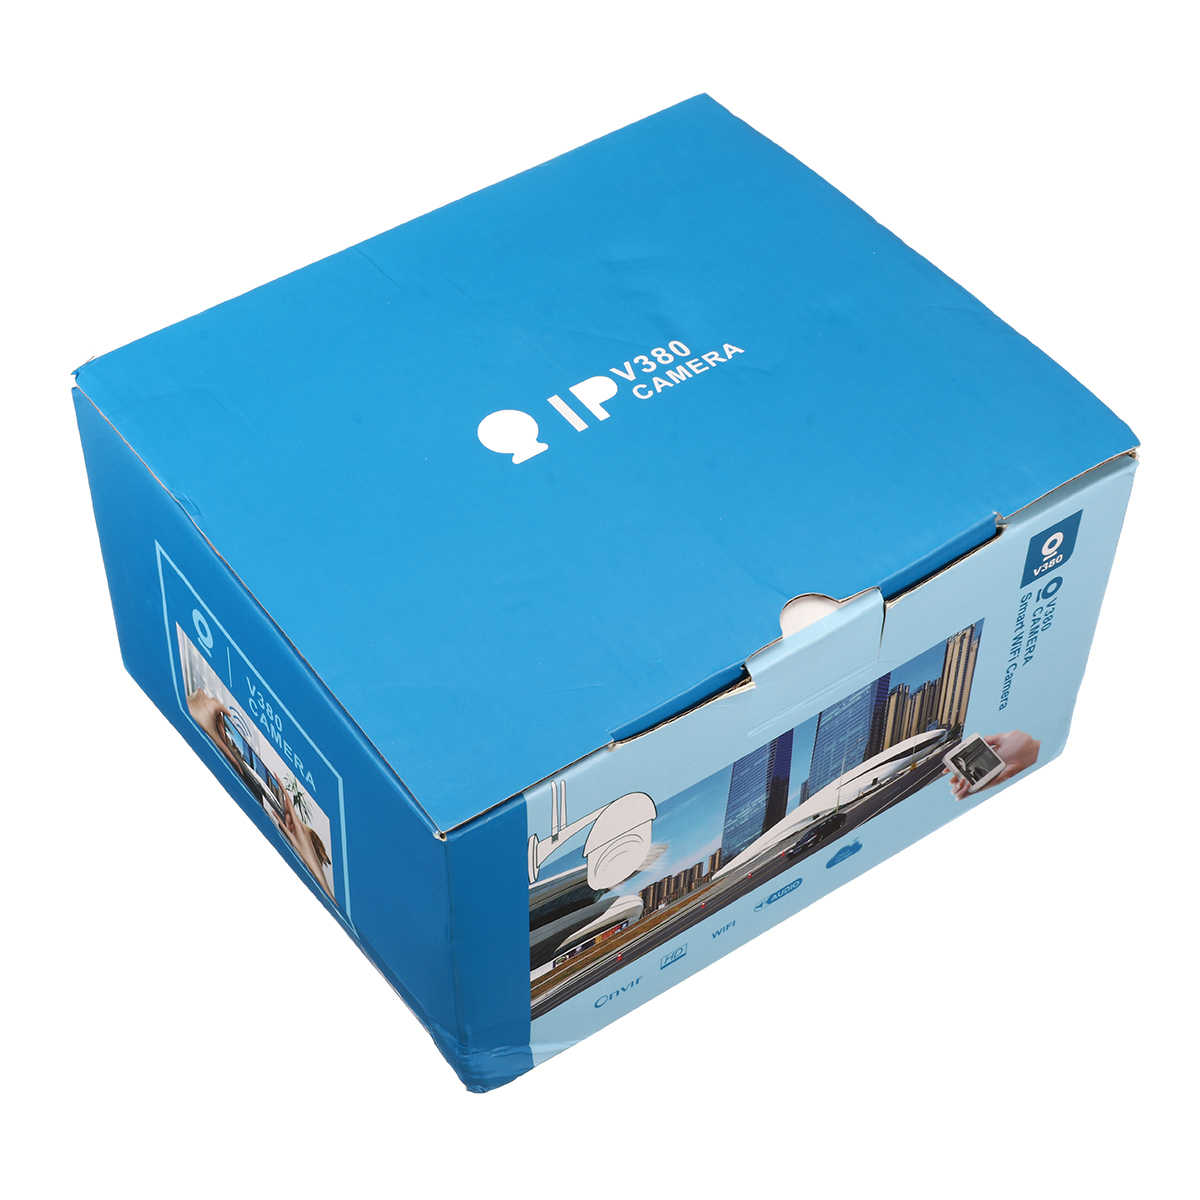 6x Zooom HD 1080P WIFI IP Kamera 8 LED Outdoor Pengawasan Keamanan Kamera Penuh Warna/Night Vision /IP66 Tahan Air/PTZ